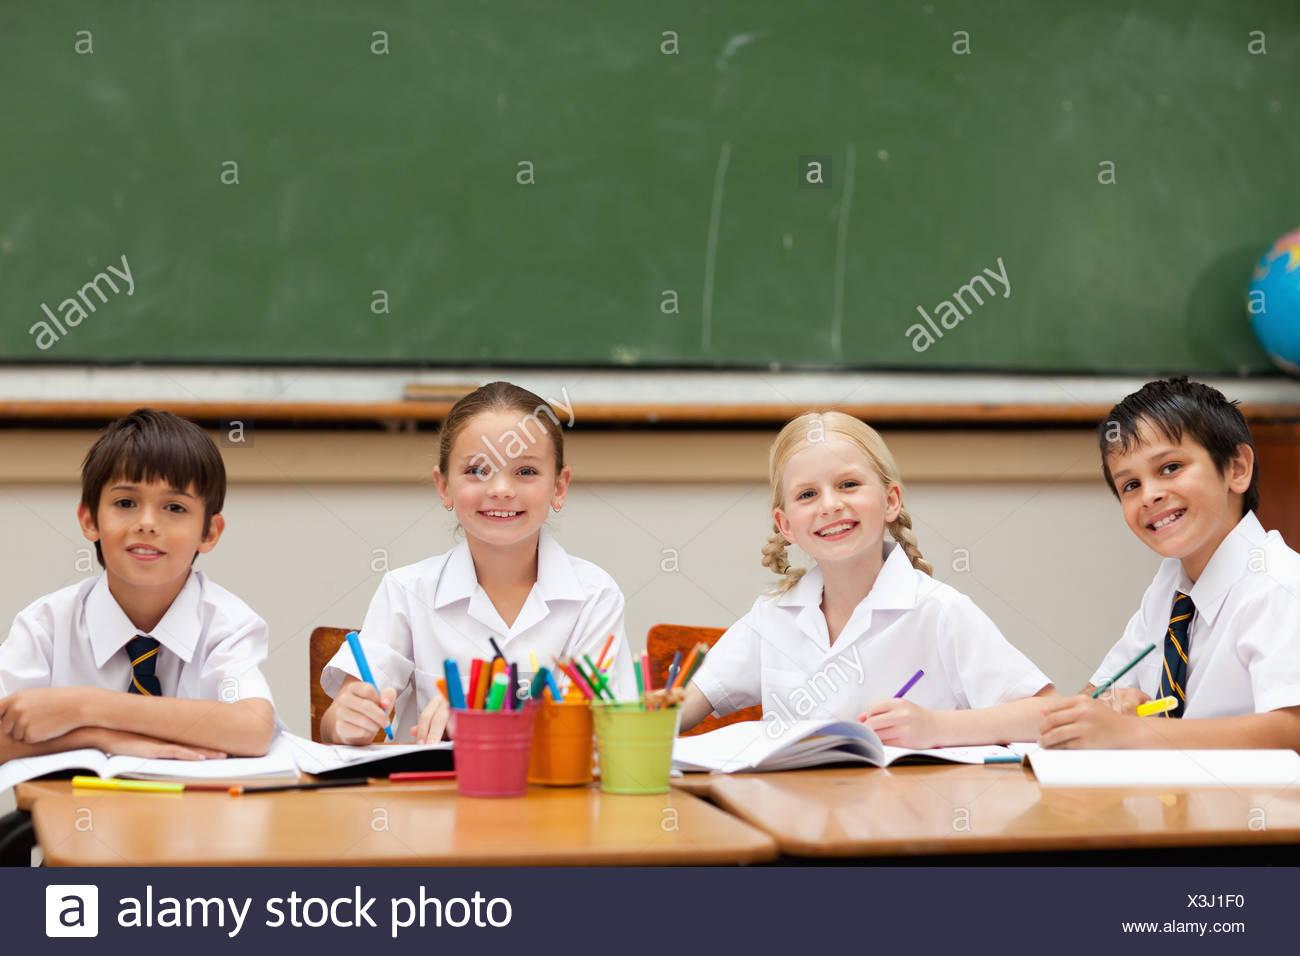 Smiling schoolchildren sitting at desk together Stock Photo